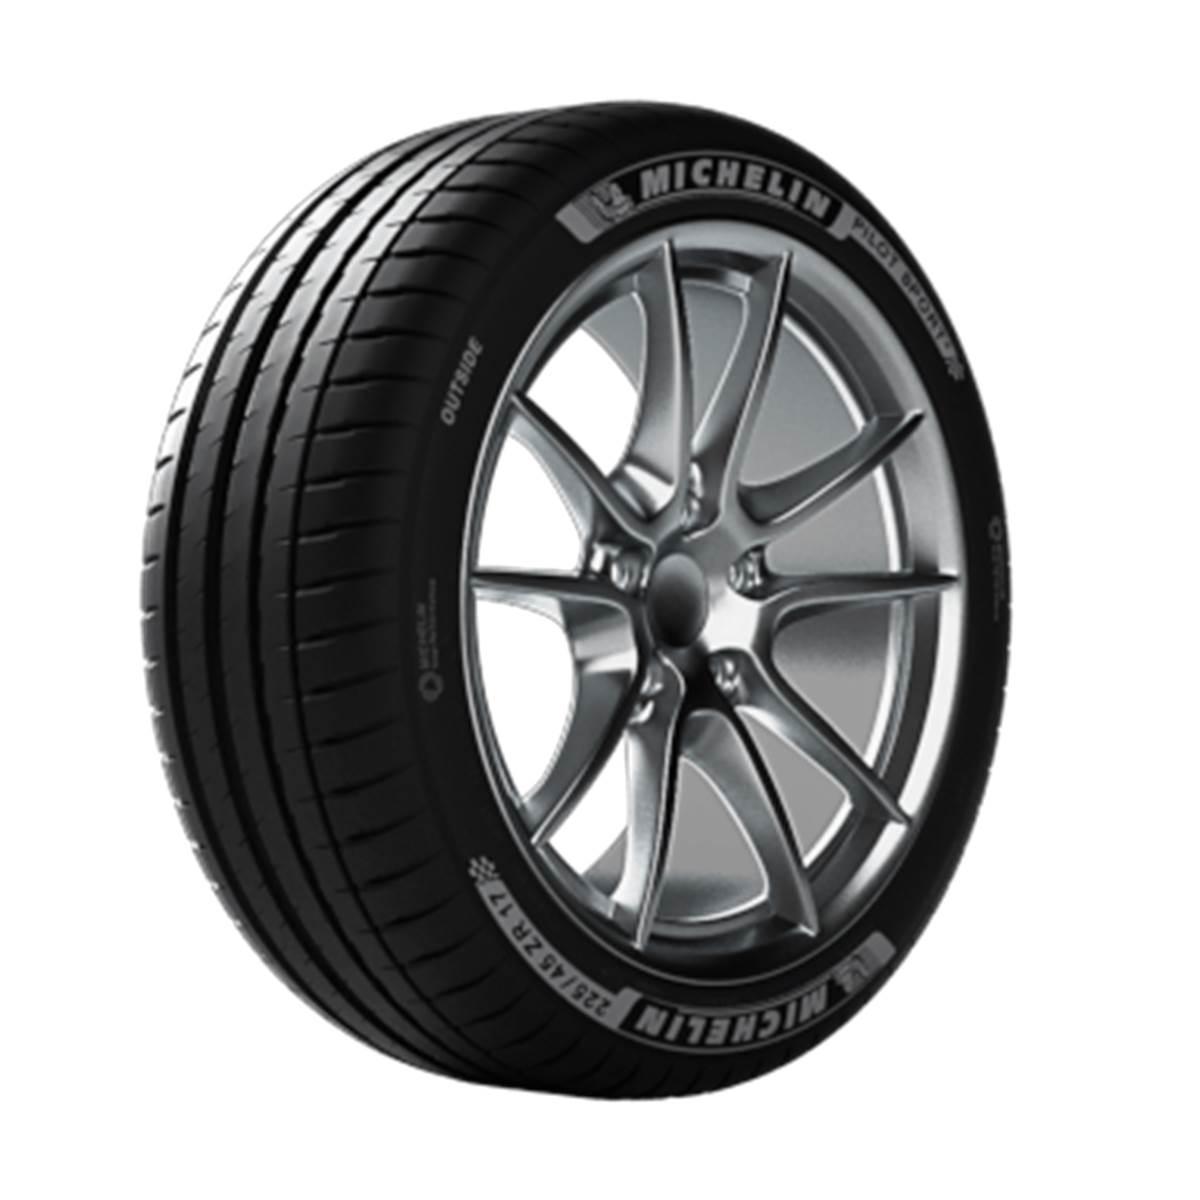 michelin pilot sport 225 45 r18 achat de pneus michelin. Black Bedroom Furniture Sets. Home Design Ideas